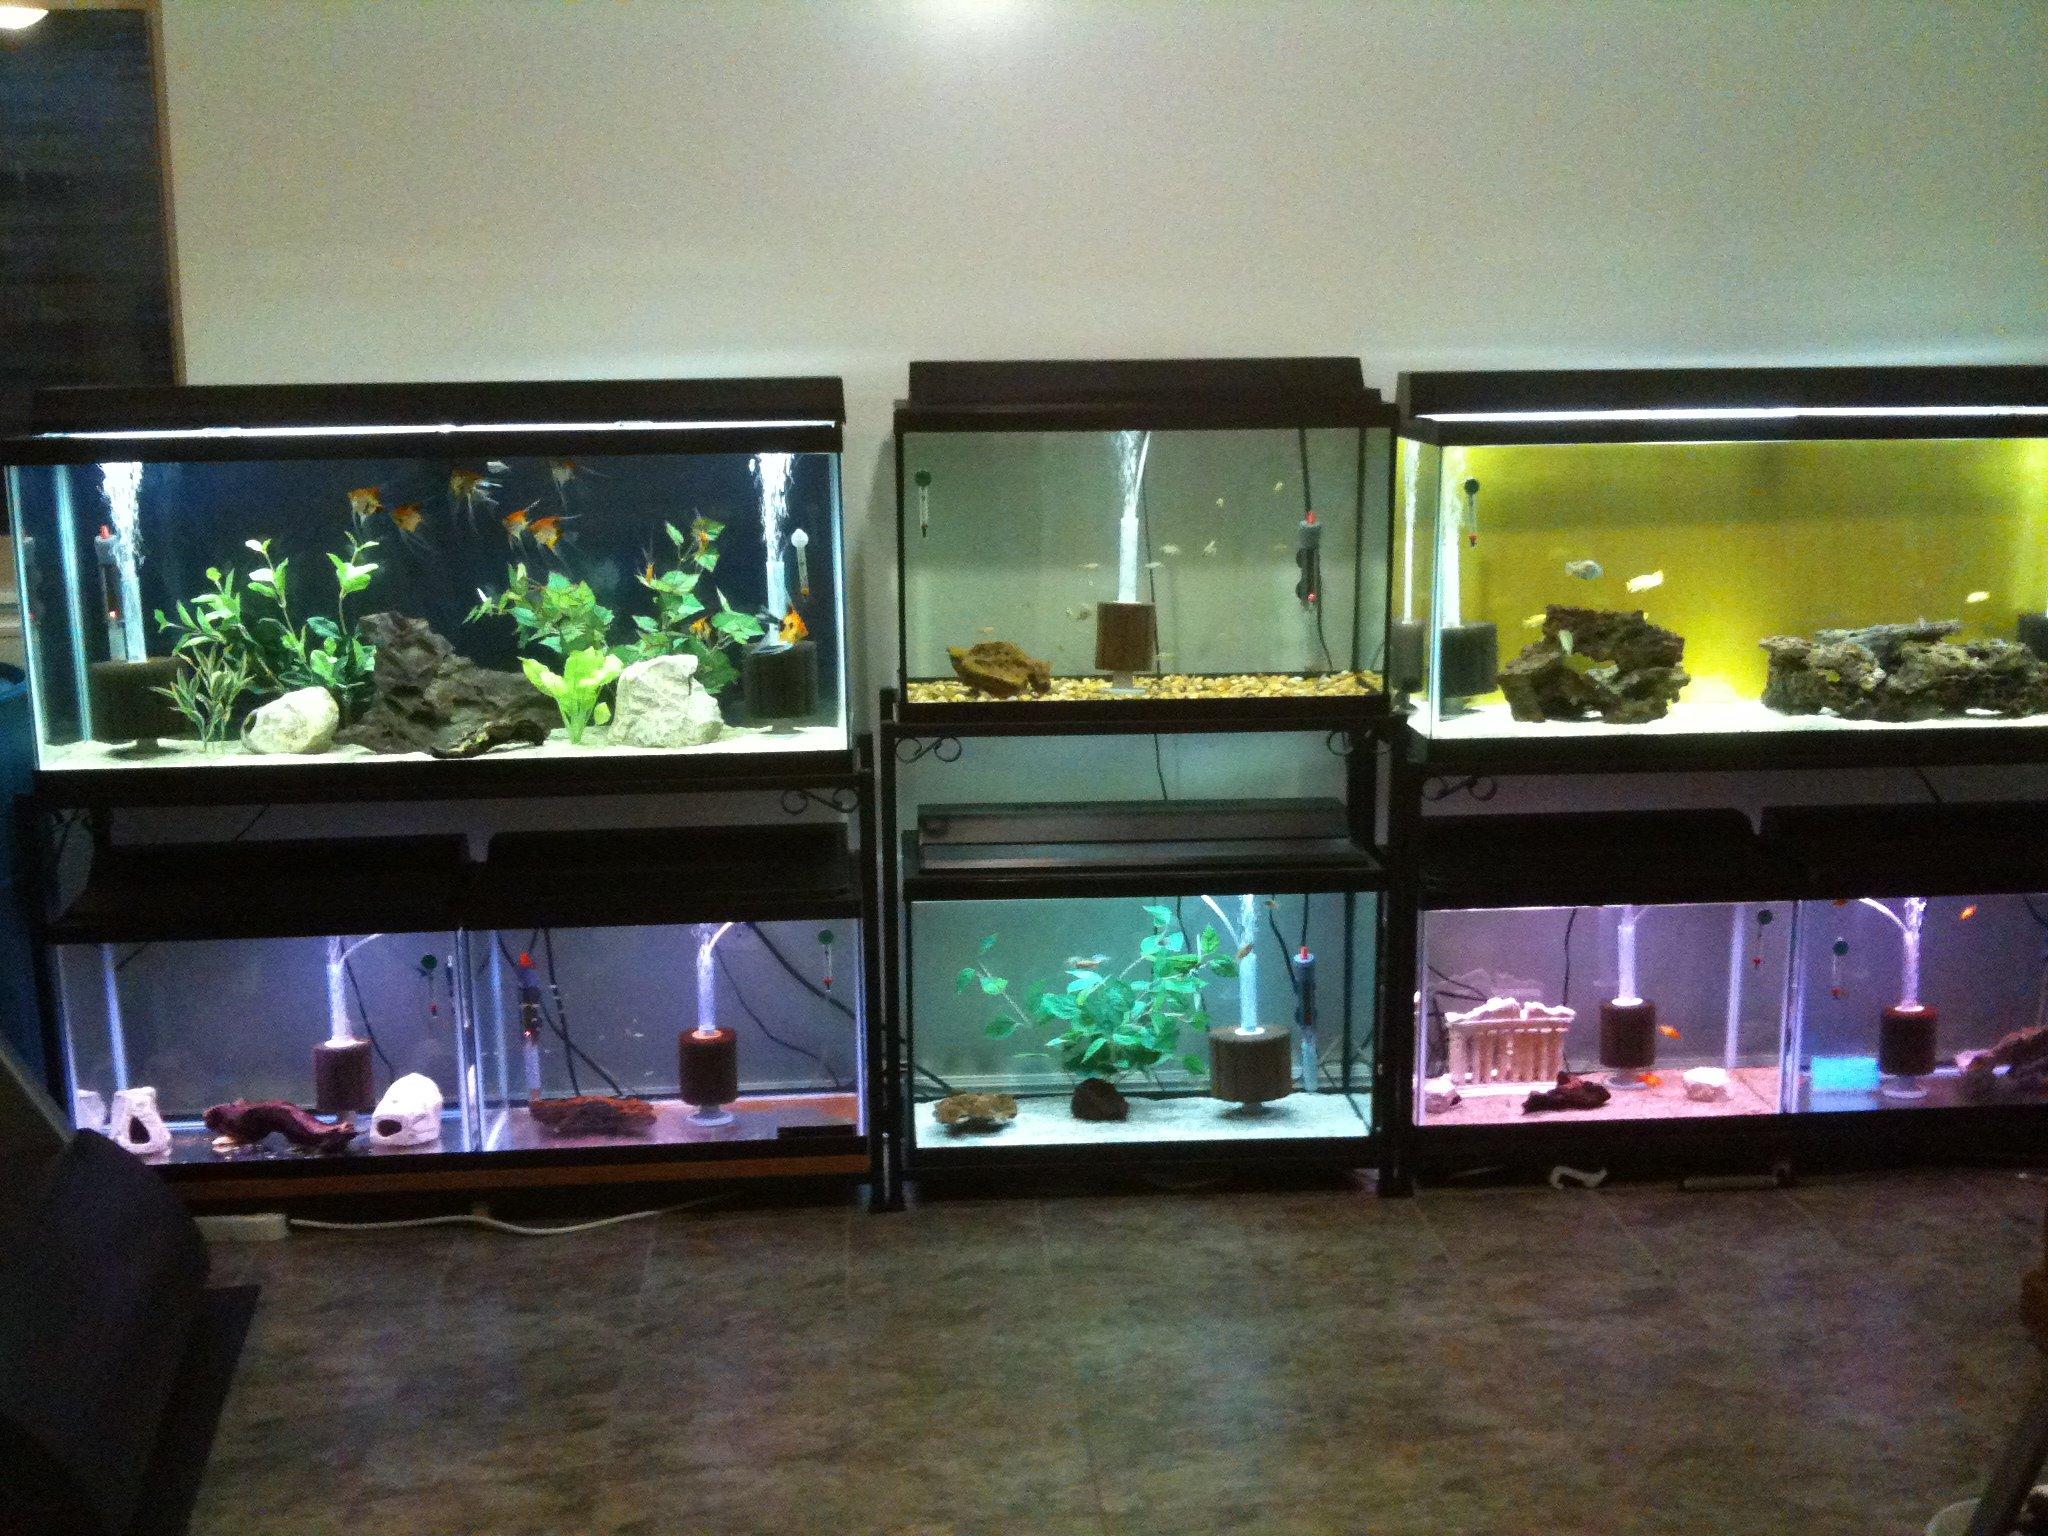 Aquarium fish tank for sale - Episode 60 Podcast Resources Page Aquarimax